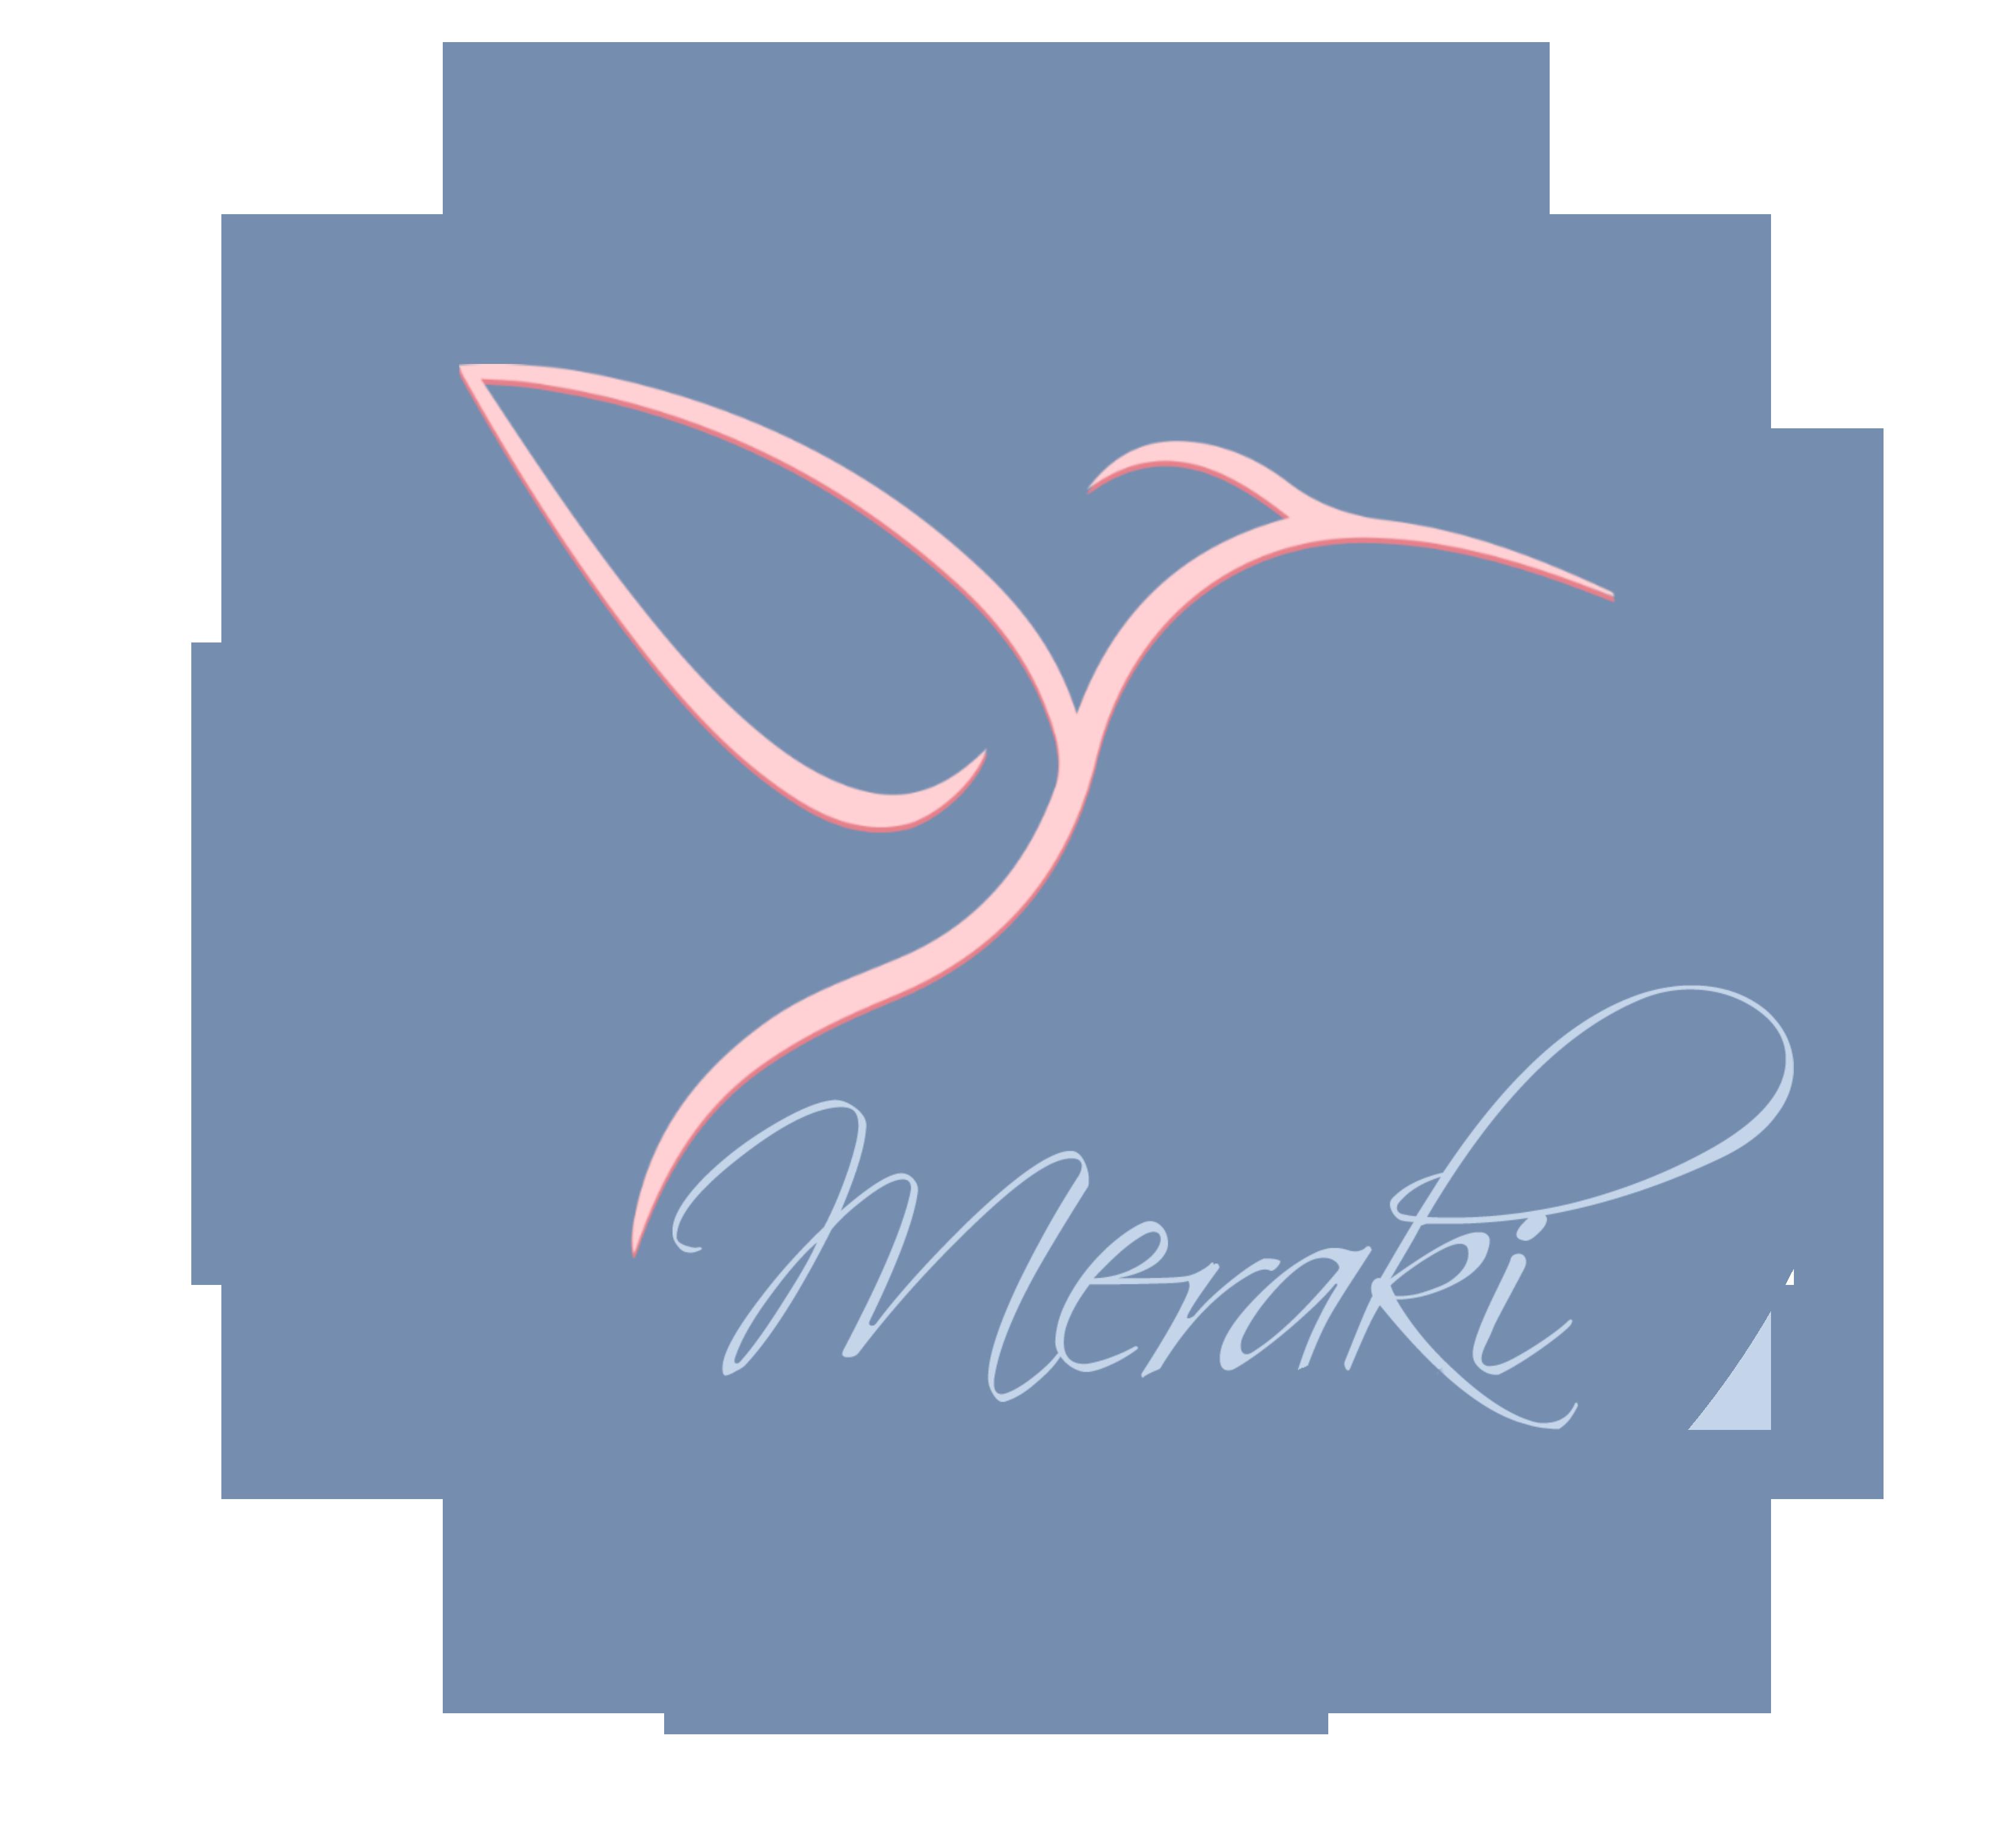 Mearki Symbol